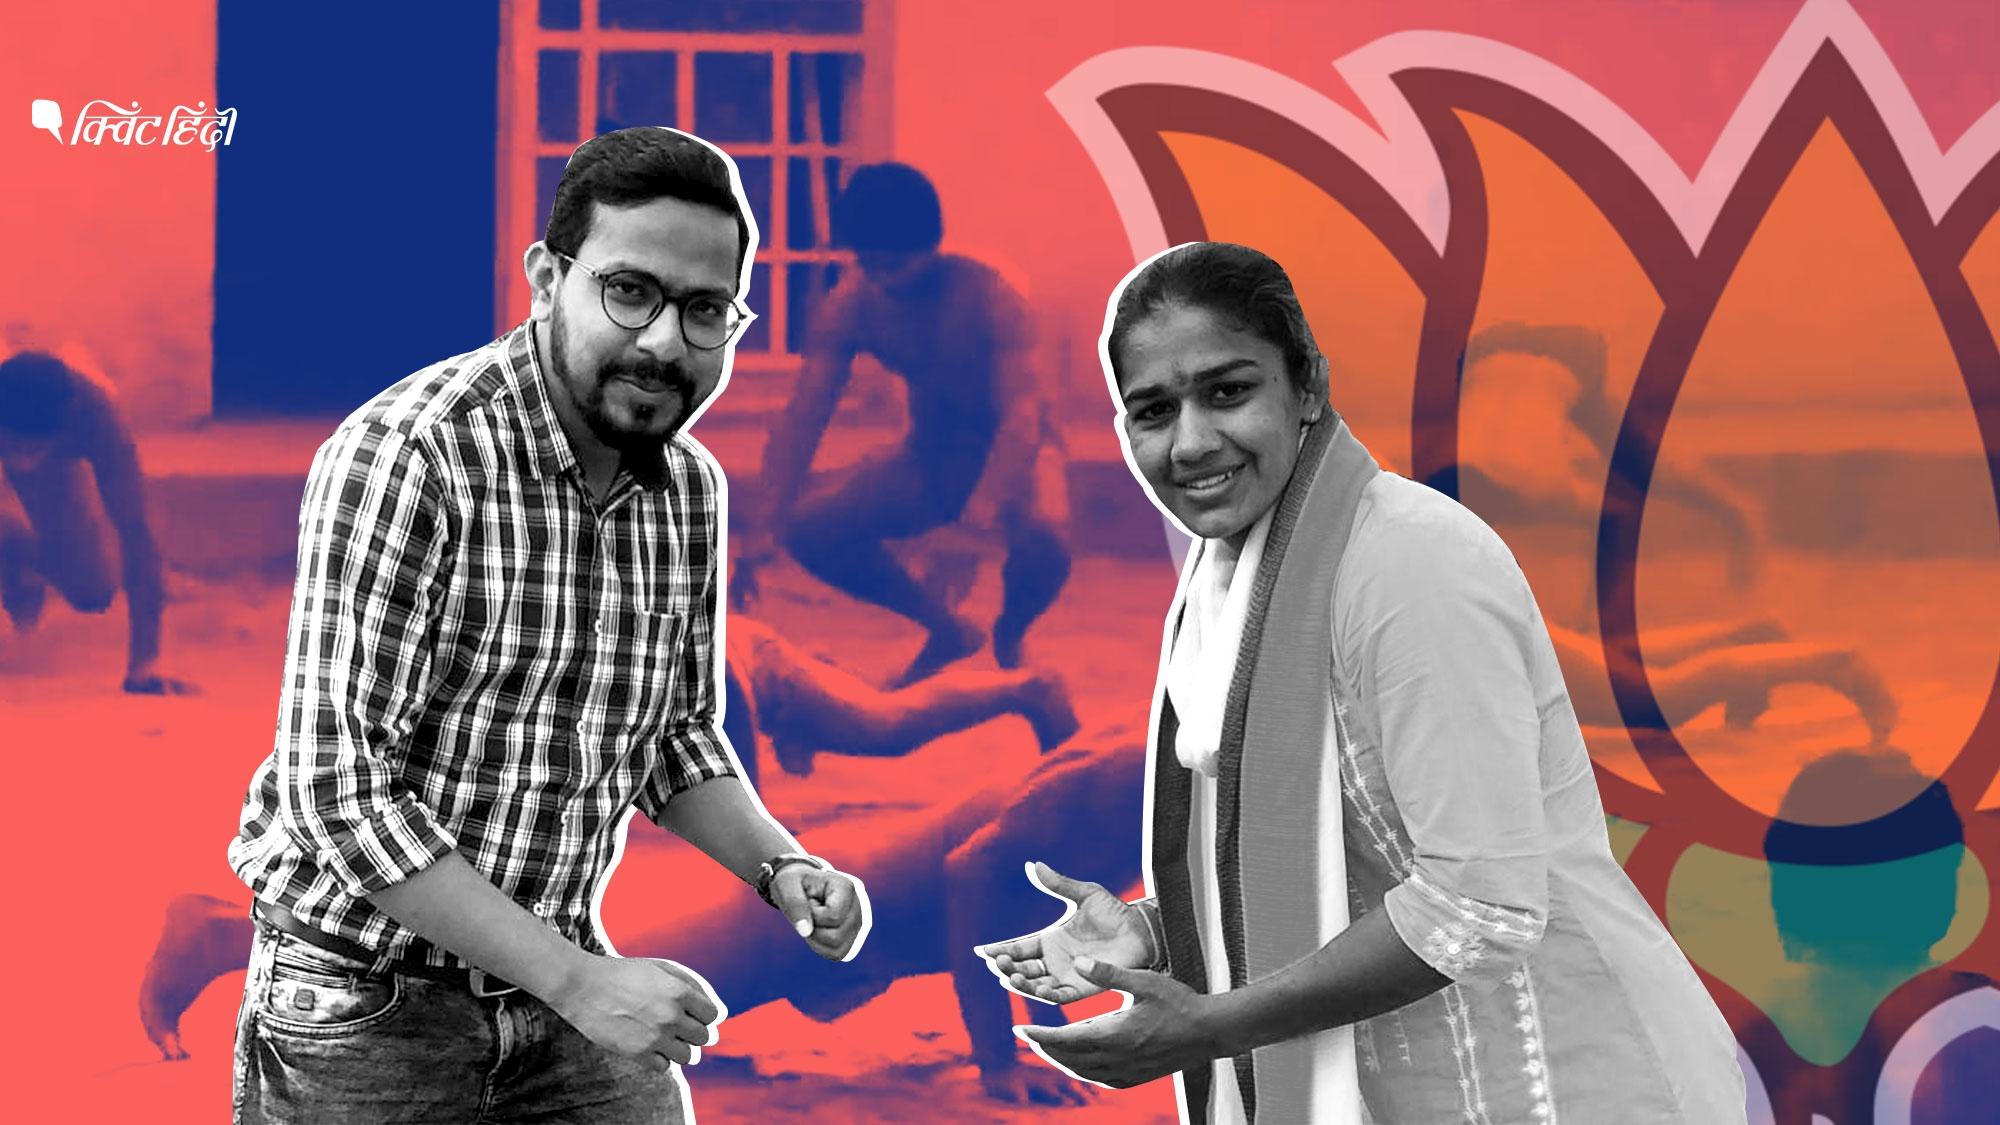 BJP Candidate Babita Phogat on Election 'Dangal' in Haryana & More